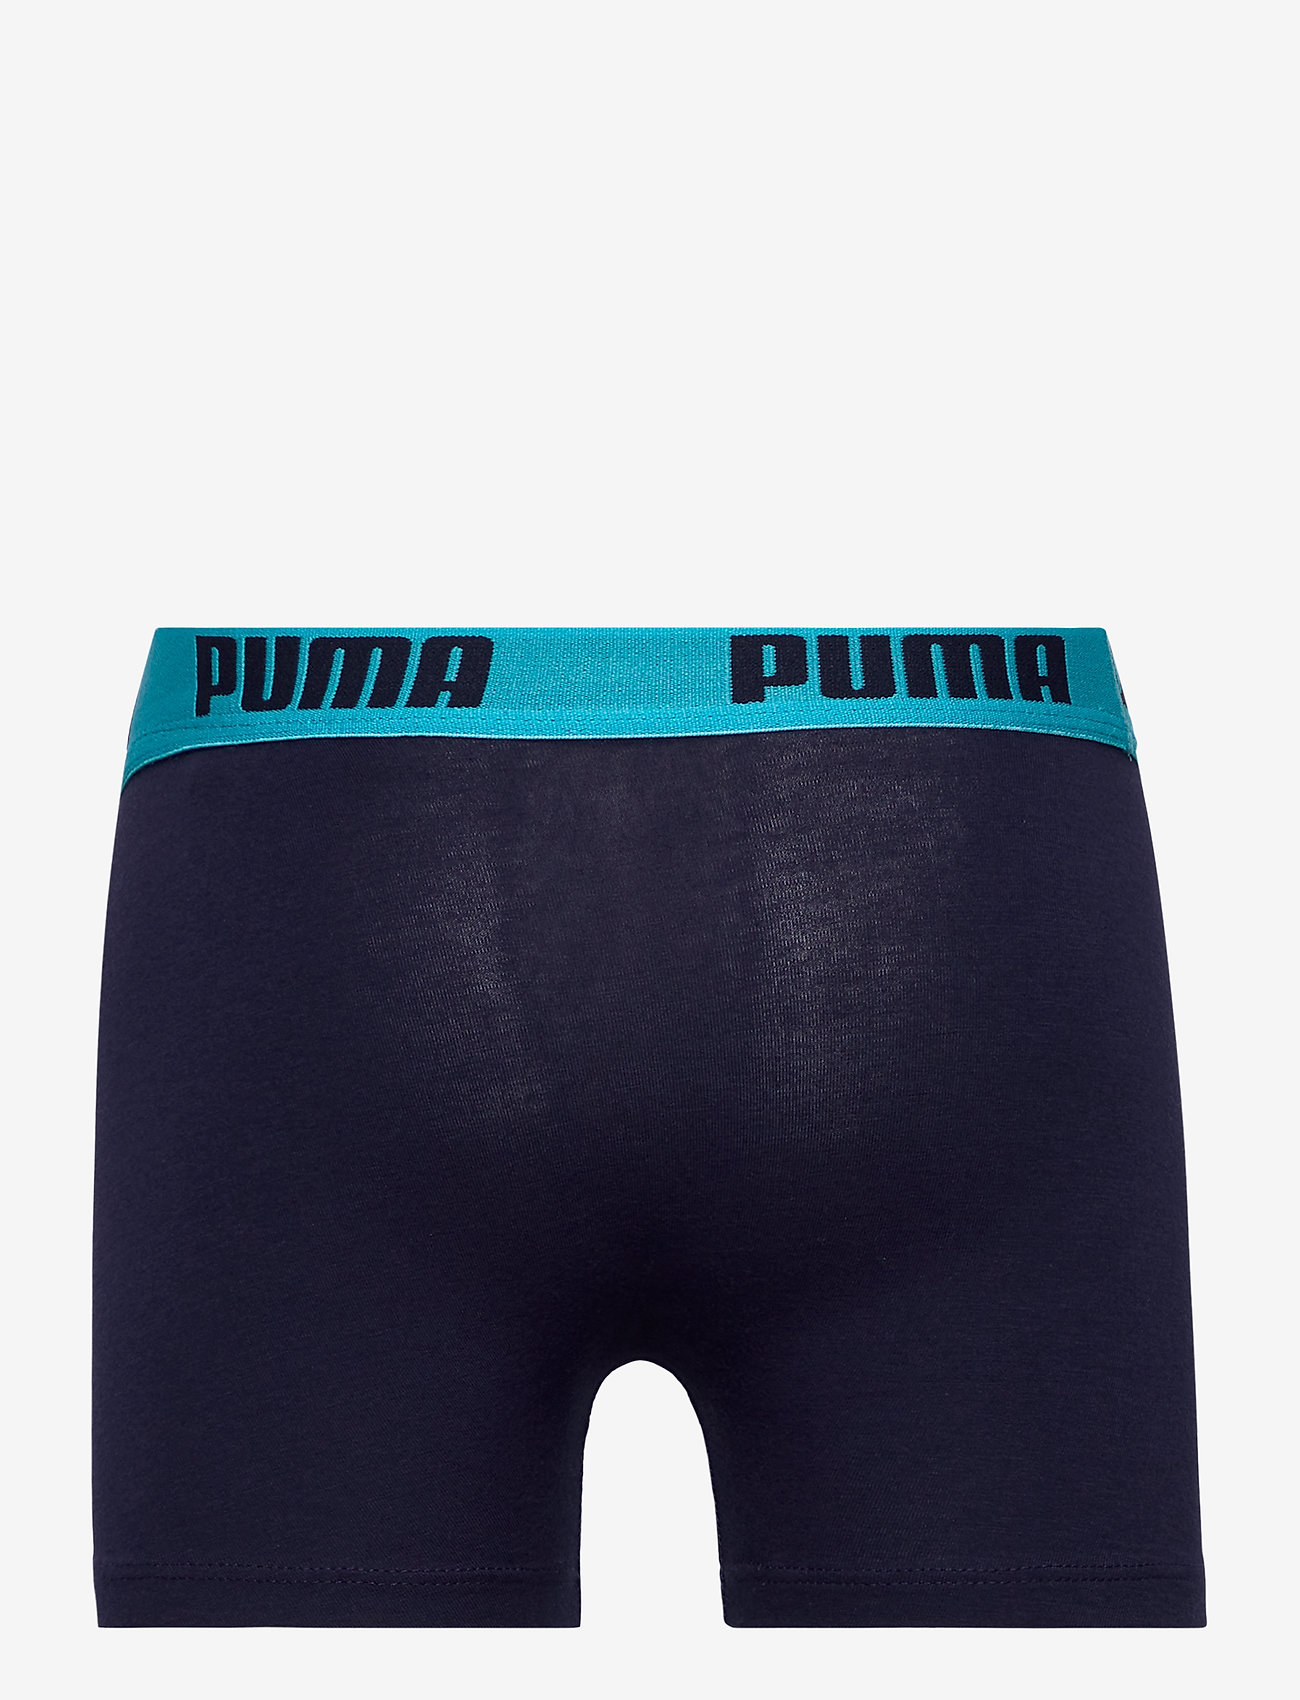 PUMA - PUMA BOYS BASIC BOXER PRINTED STRIP - nederdelar - fluo red / blue - 1